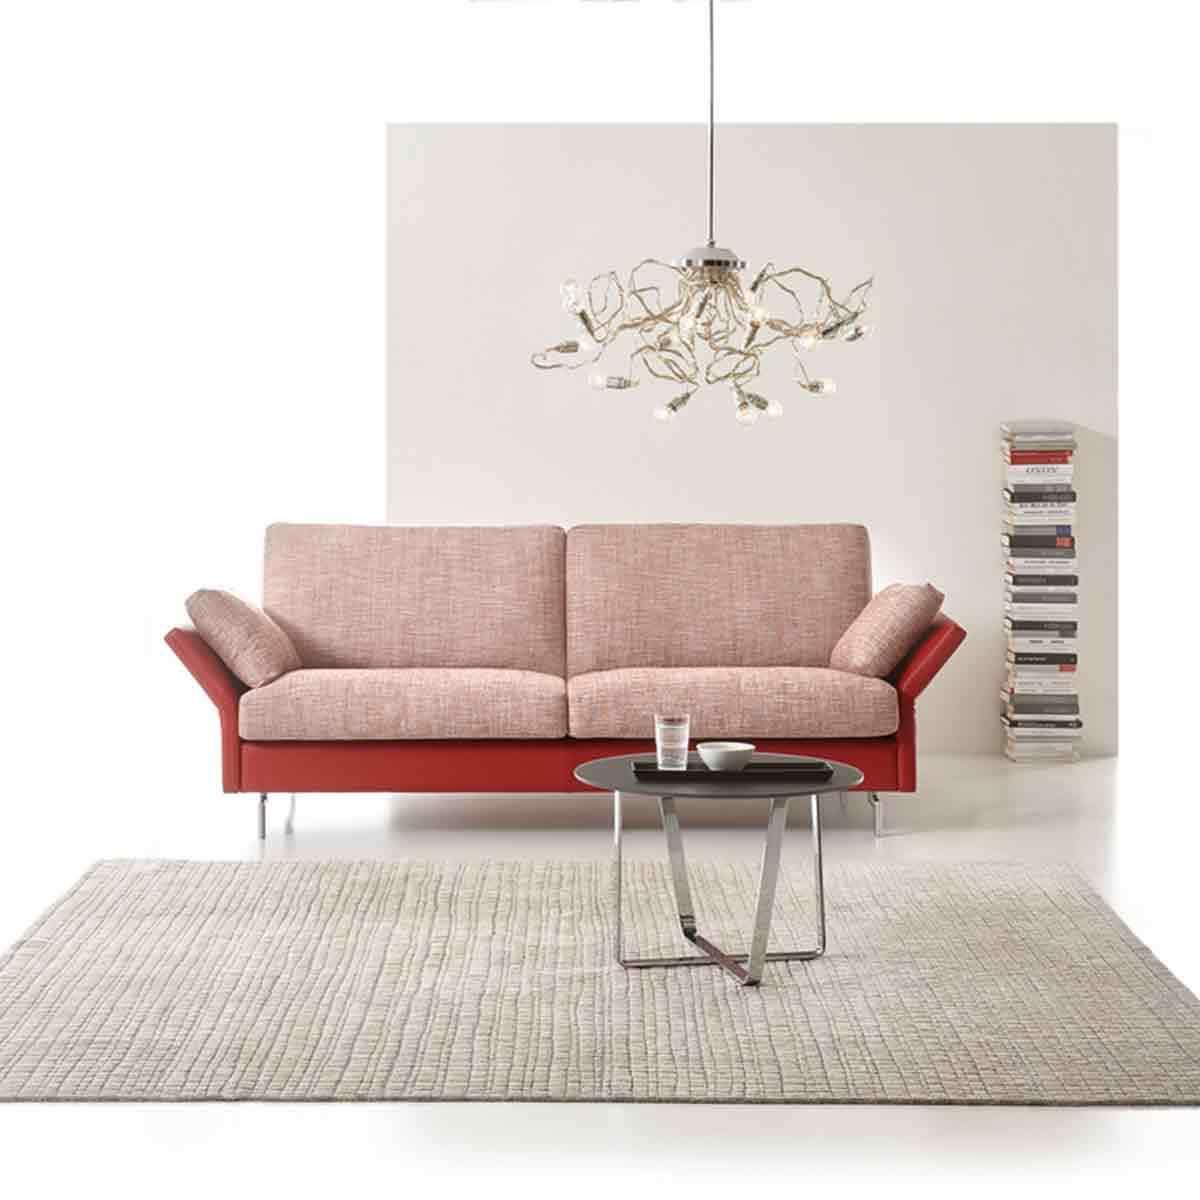 Sofa rot von Erpo inkl. Kissen